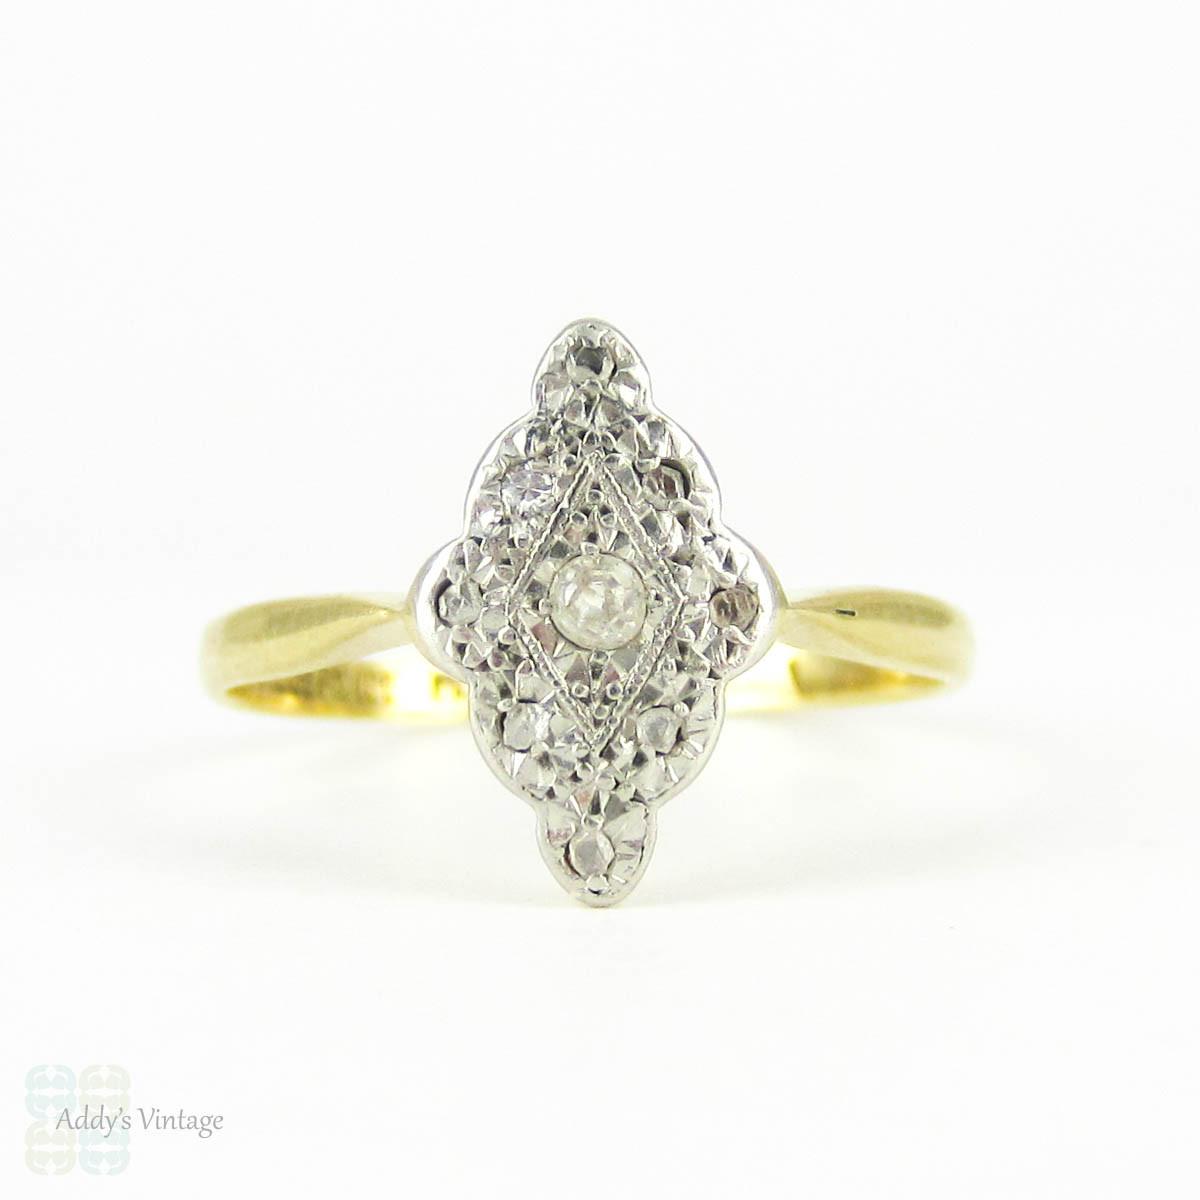 Edwardian Navette Shape Diamond Ring Elongated Diamond